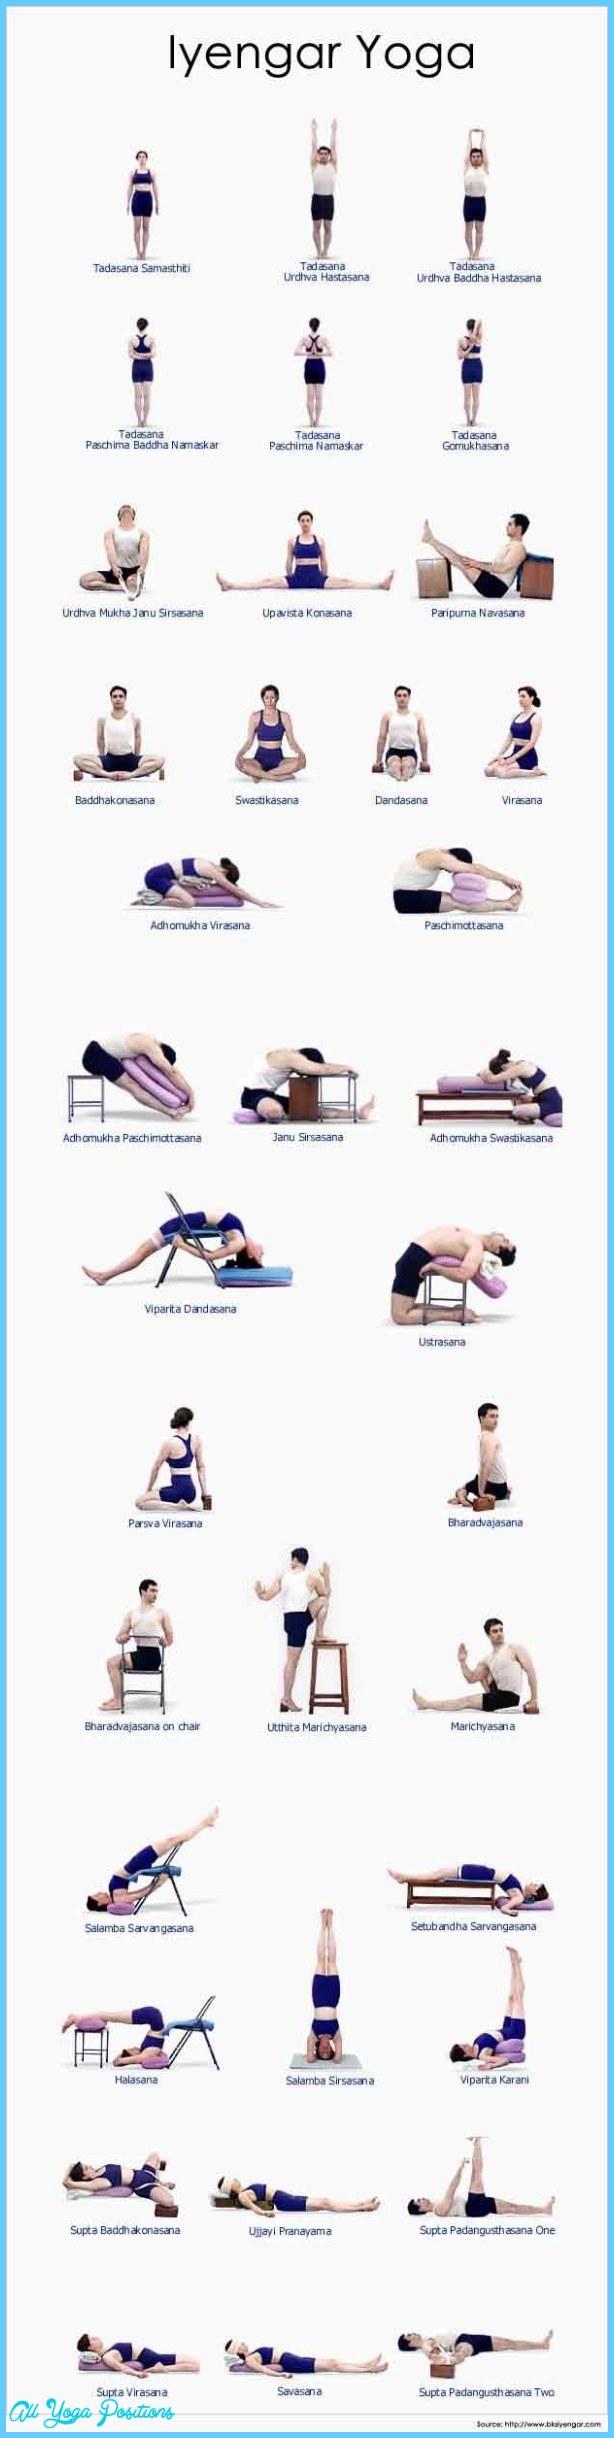 Different Yoga Poses_22.jpg